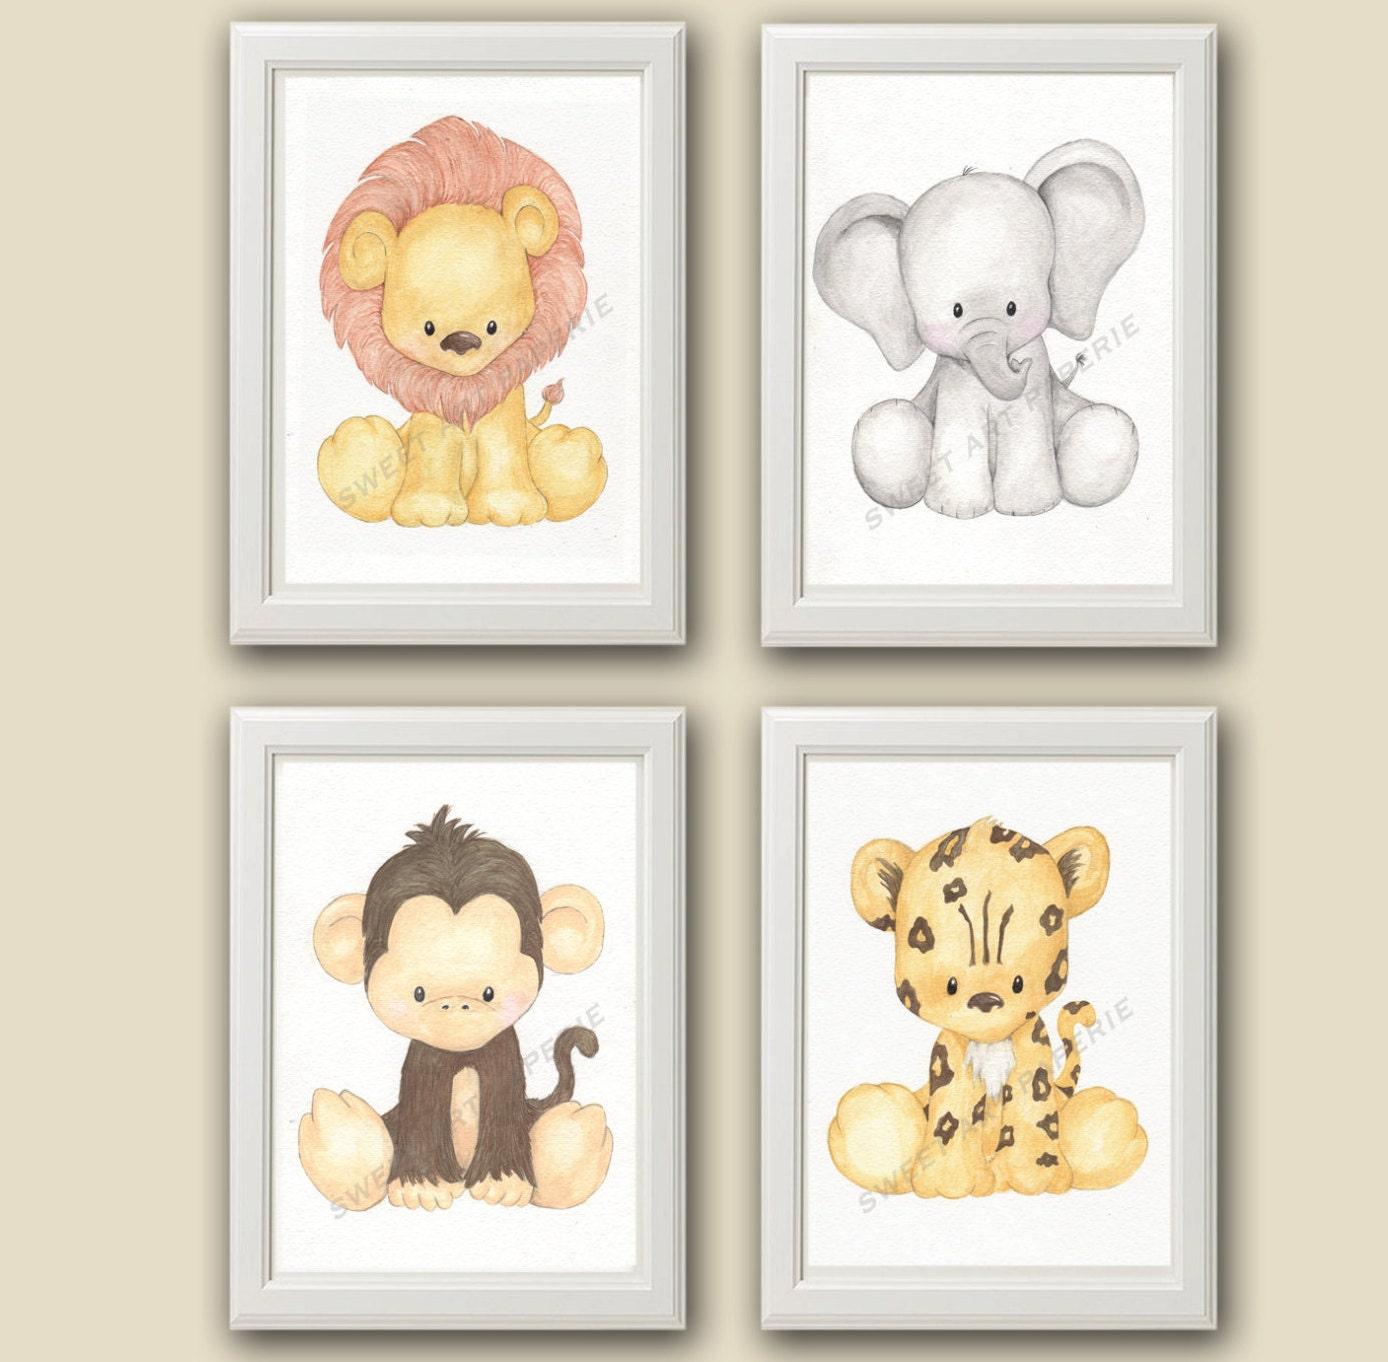 Safari Nursery Decor Jungle Theme Nursery Nursery Artwork: Safari Nursery Art Watercolor Nursery Decor Set Of 4